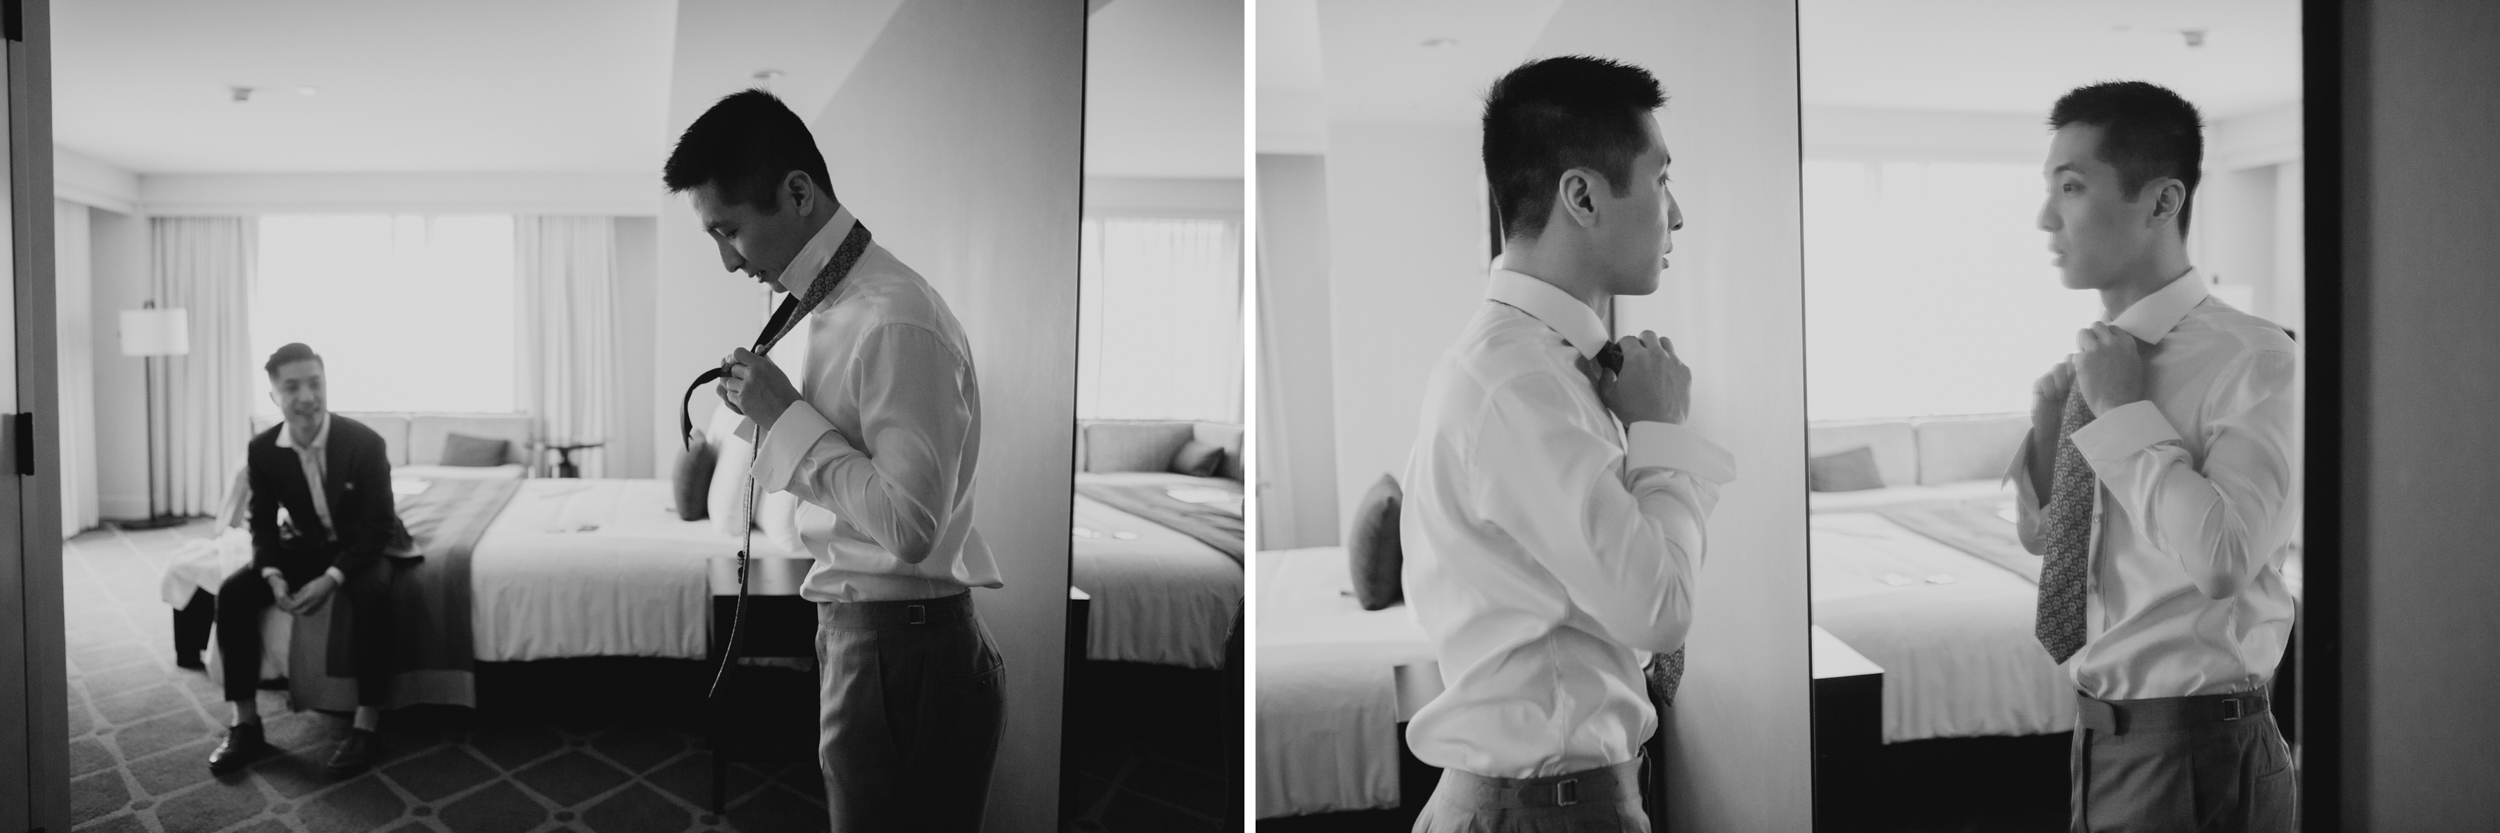 Mindy_Bo_Boston_Wedding_MIT_HotelCommonwealth_003.jpg